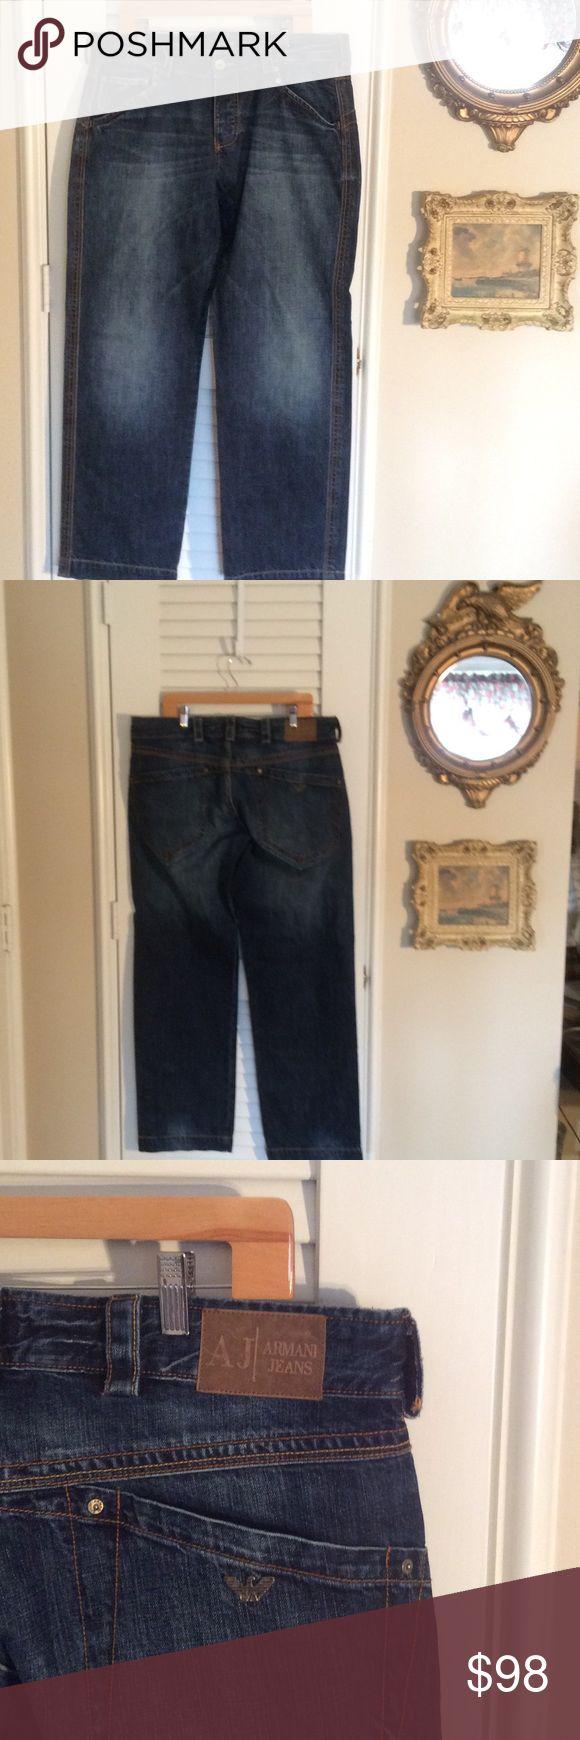 👔👔 MENS VINTAGE ARMANI JEANS BUTTON FLY, 007 SERIES INDIGO ARMANI JEANS. EXCELLENT CONDITION. SIZE 36. Armani Jeans Jeans Straight